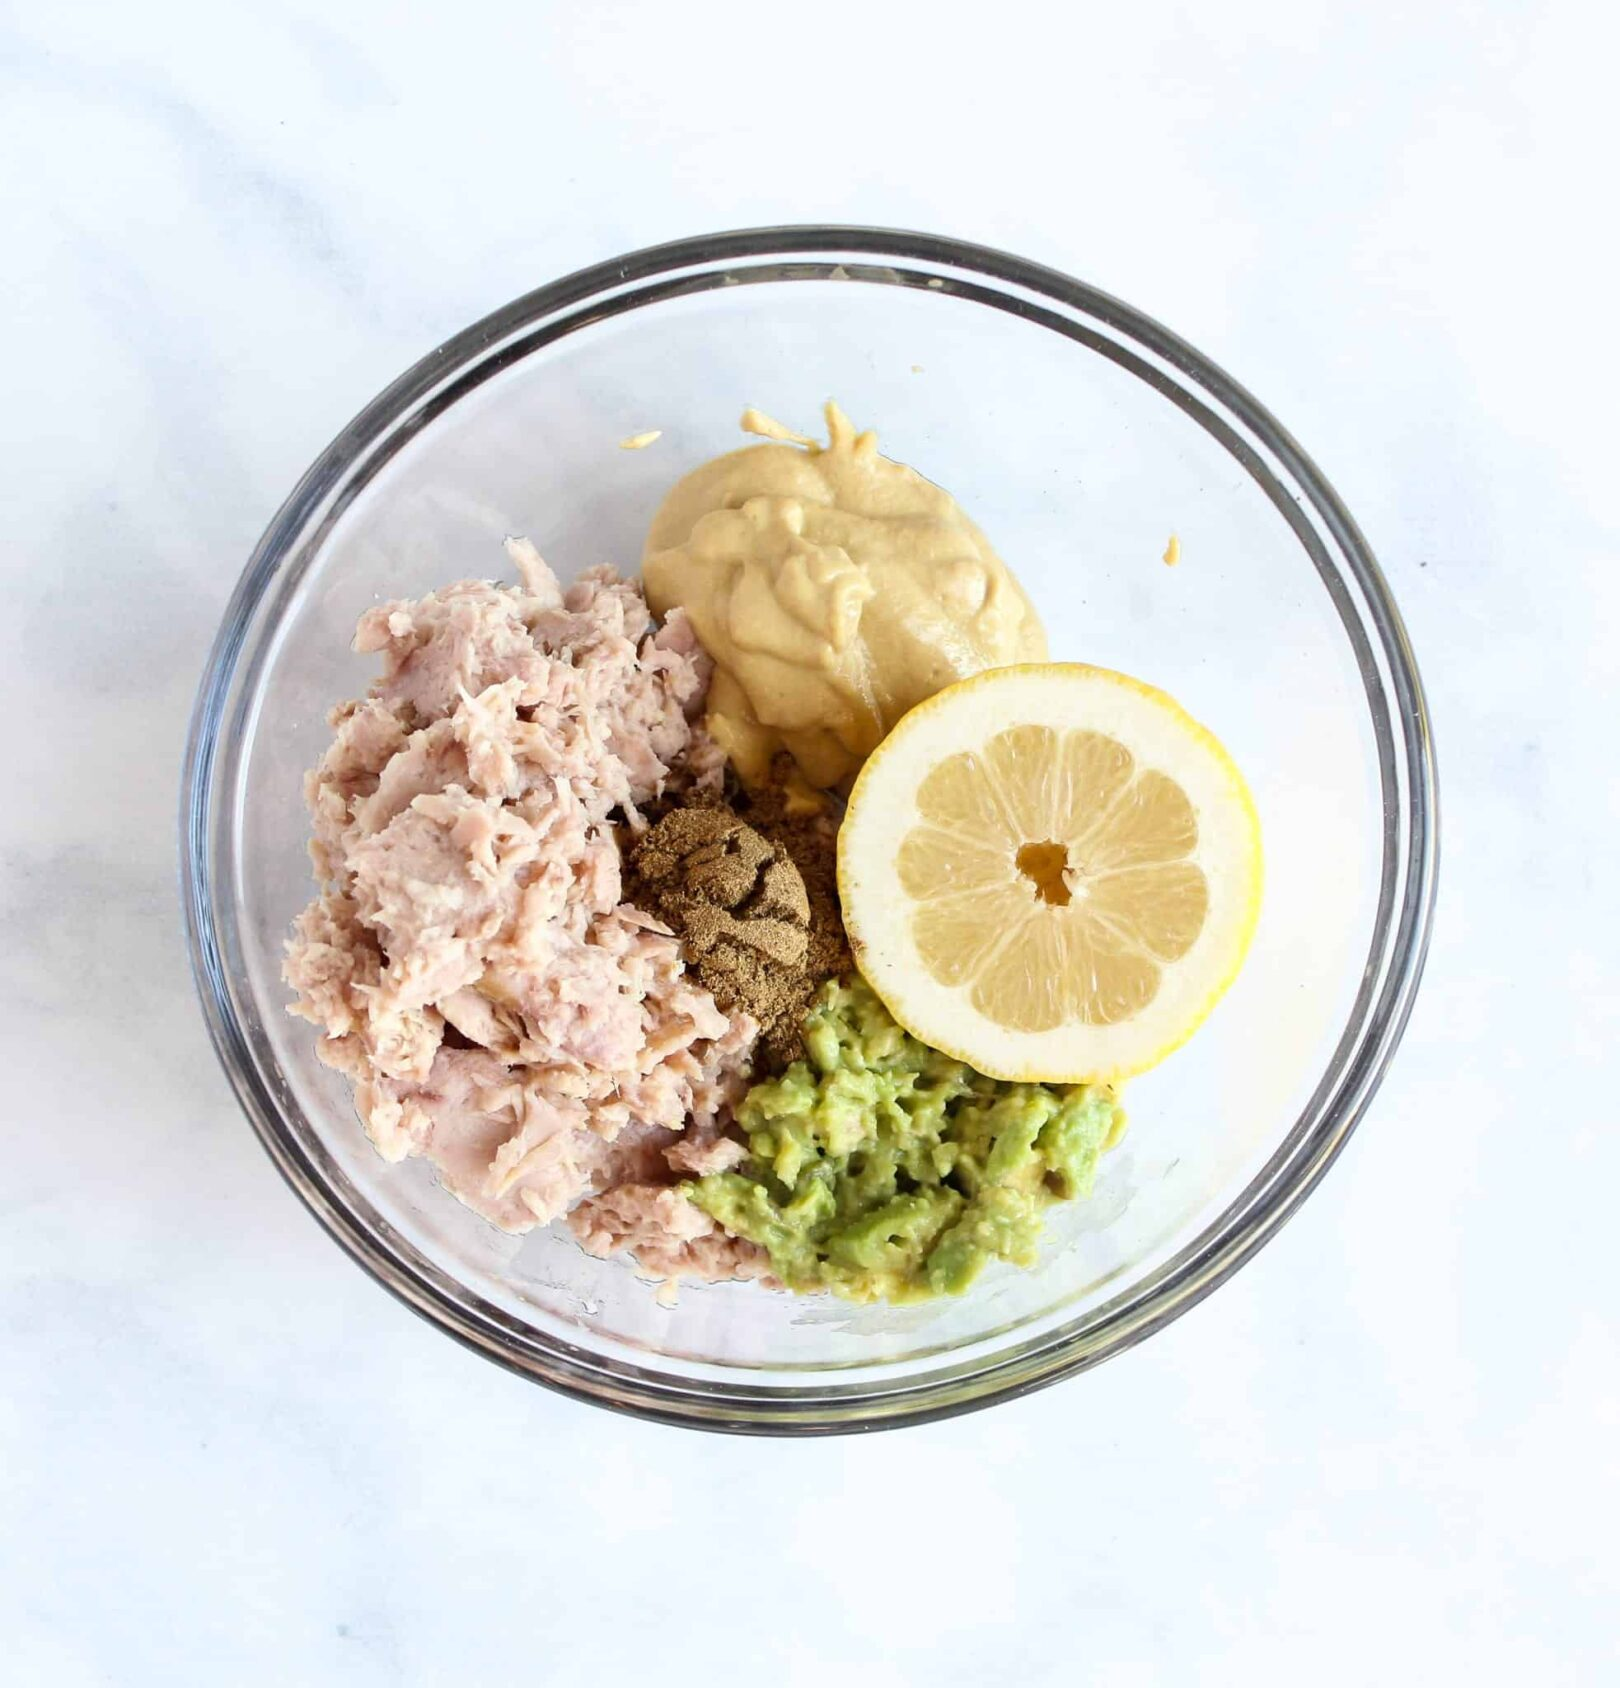 Tuna Salad with Avocado and Lemon recipe by Tara Rochford